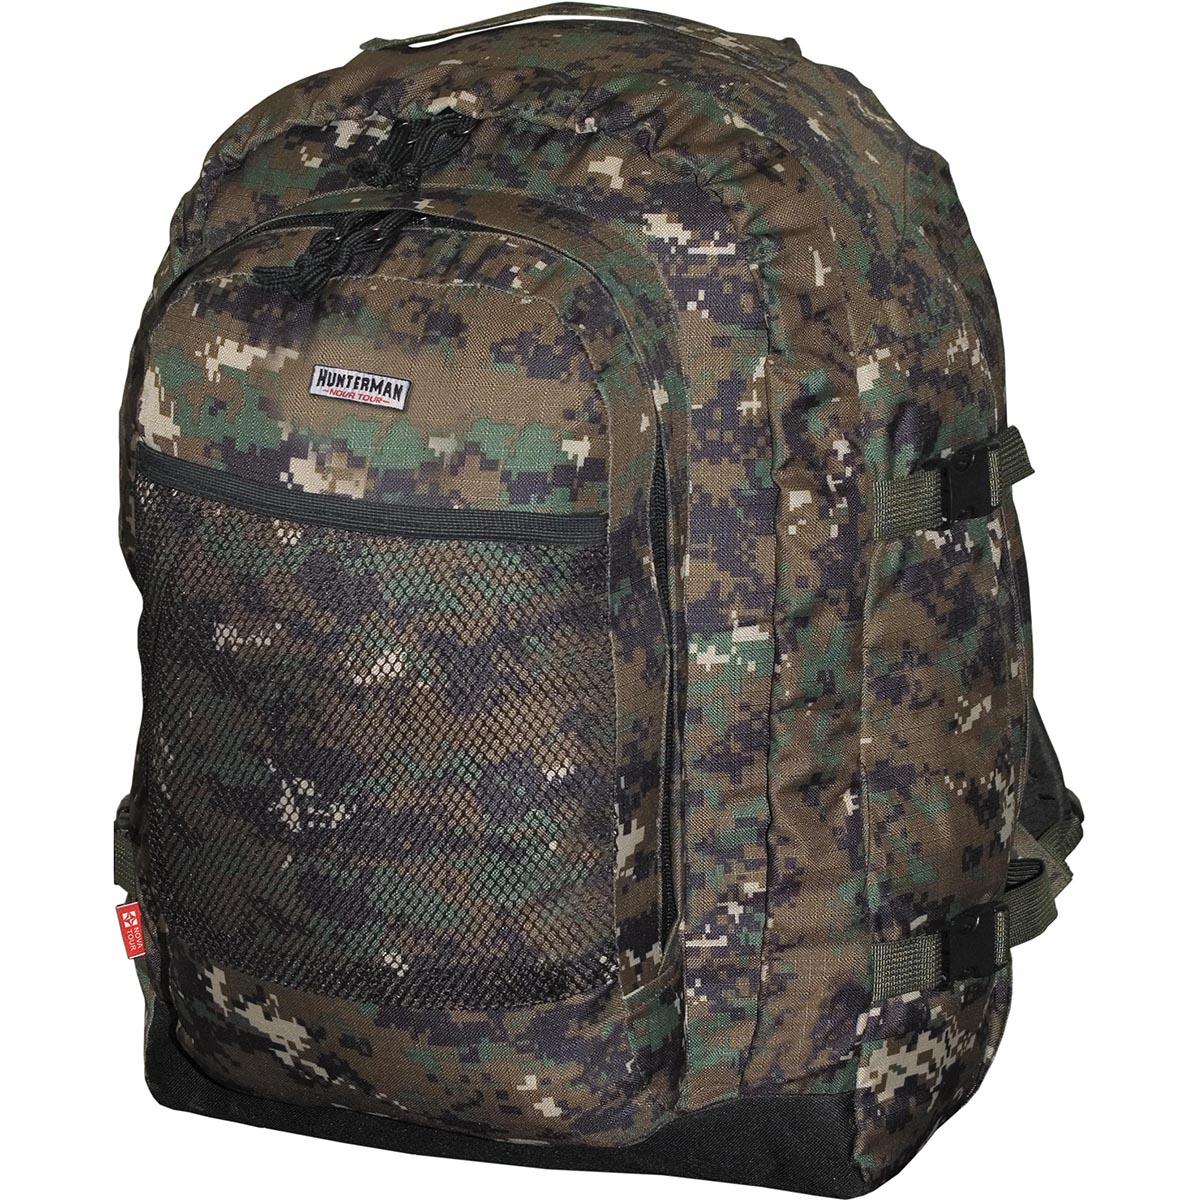 Рюкзак для охоты HunterMan Nova Tour Бекас 55 V3, цвет: темно-зеленый, 55 л